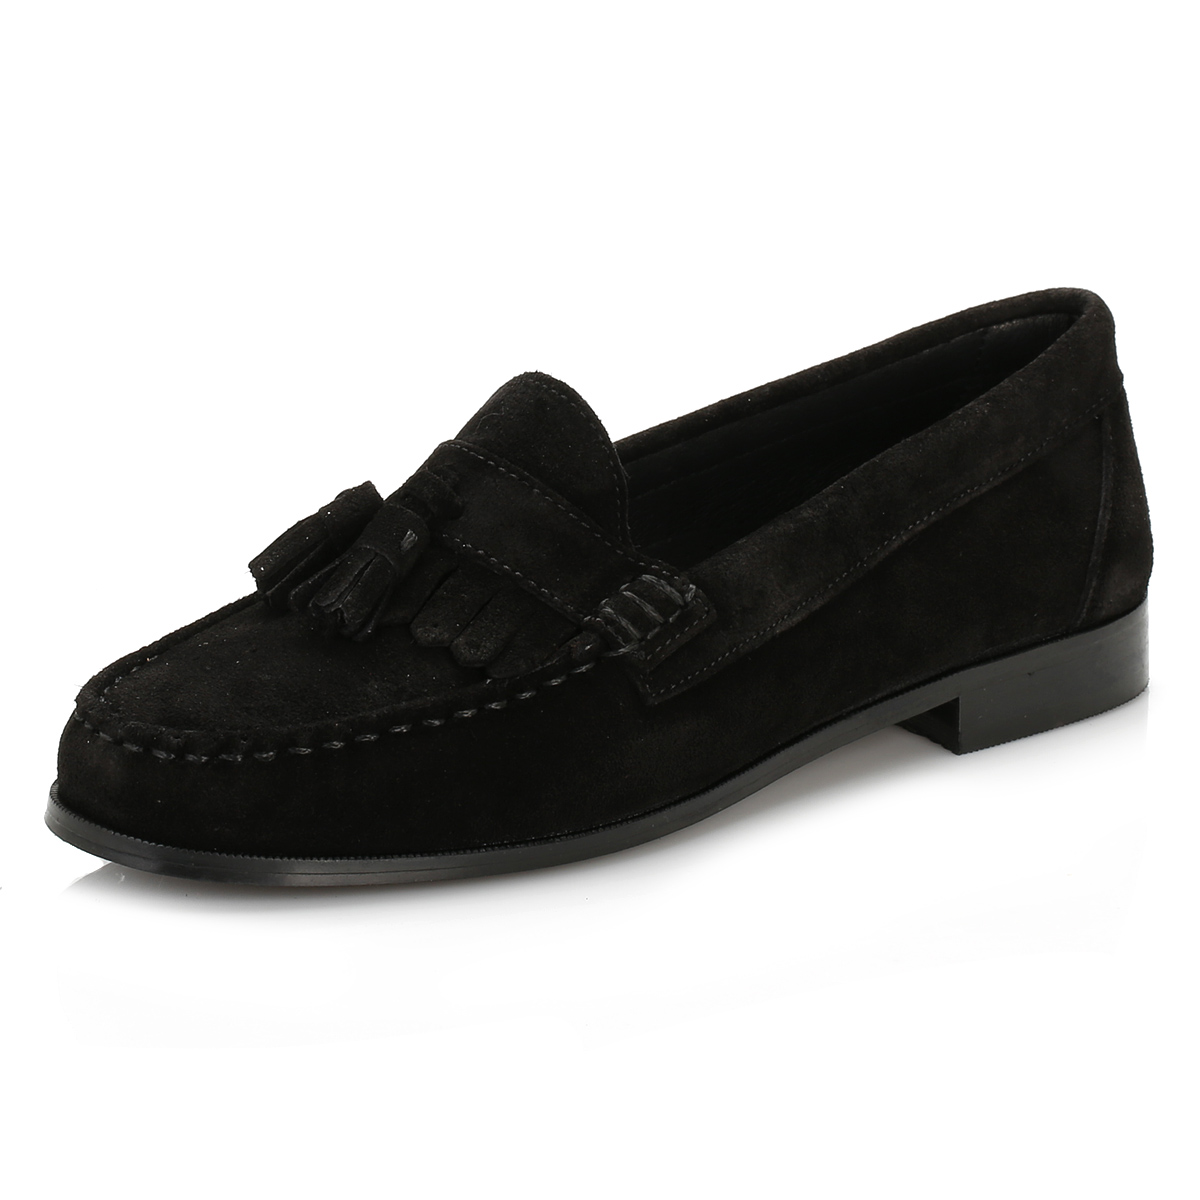 Ladies Black Boat Shoes